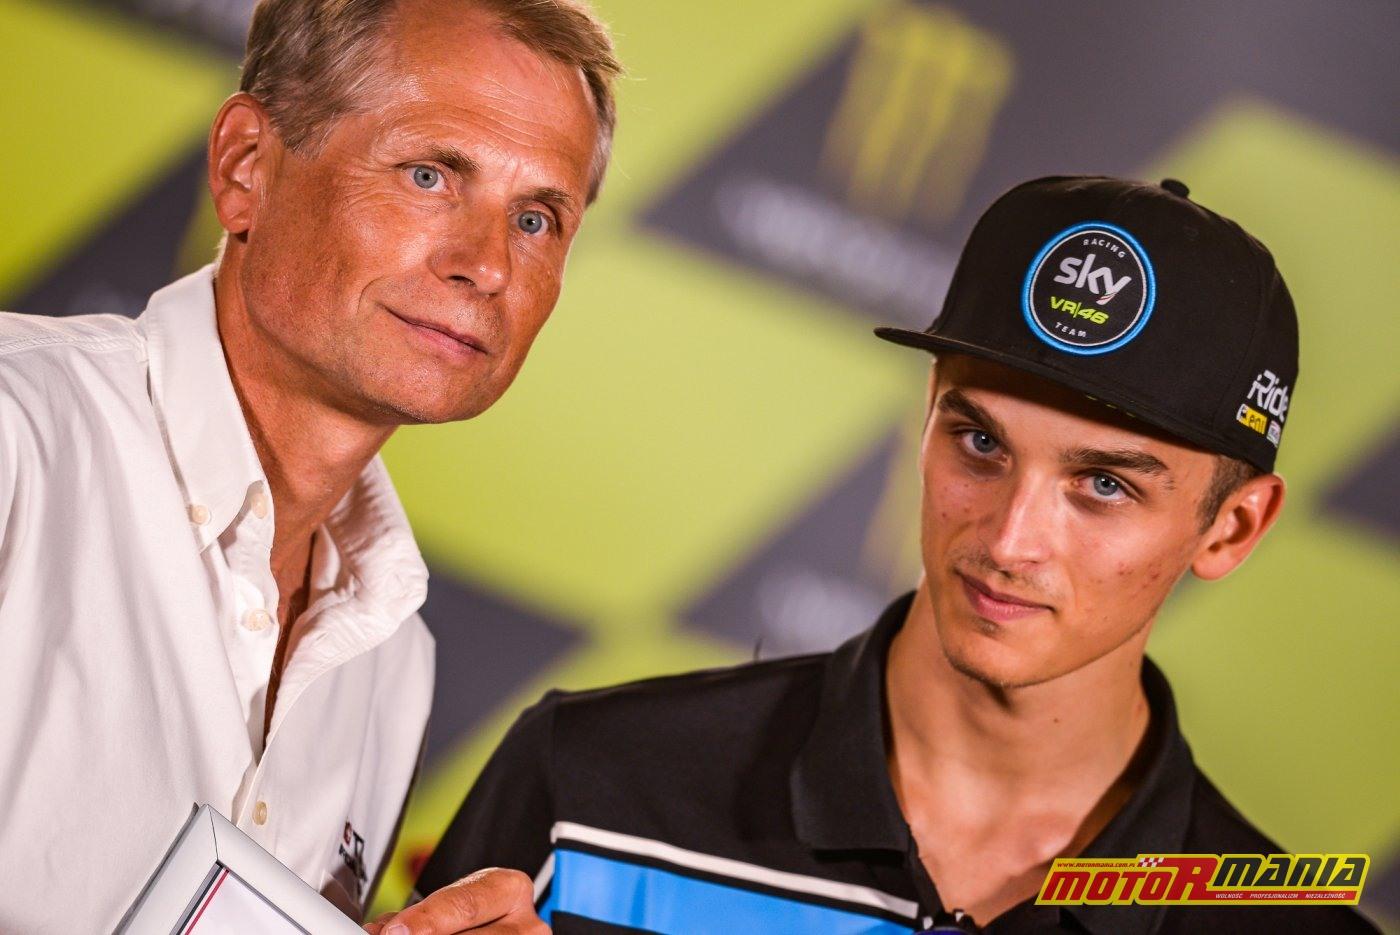 Sobota tor Brno MotoGP 2018 - fot Waldek Walerczuk (9)